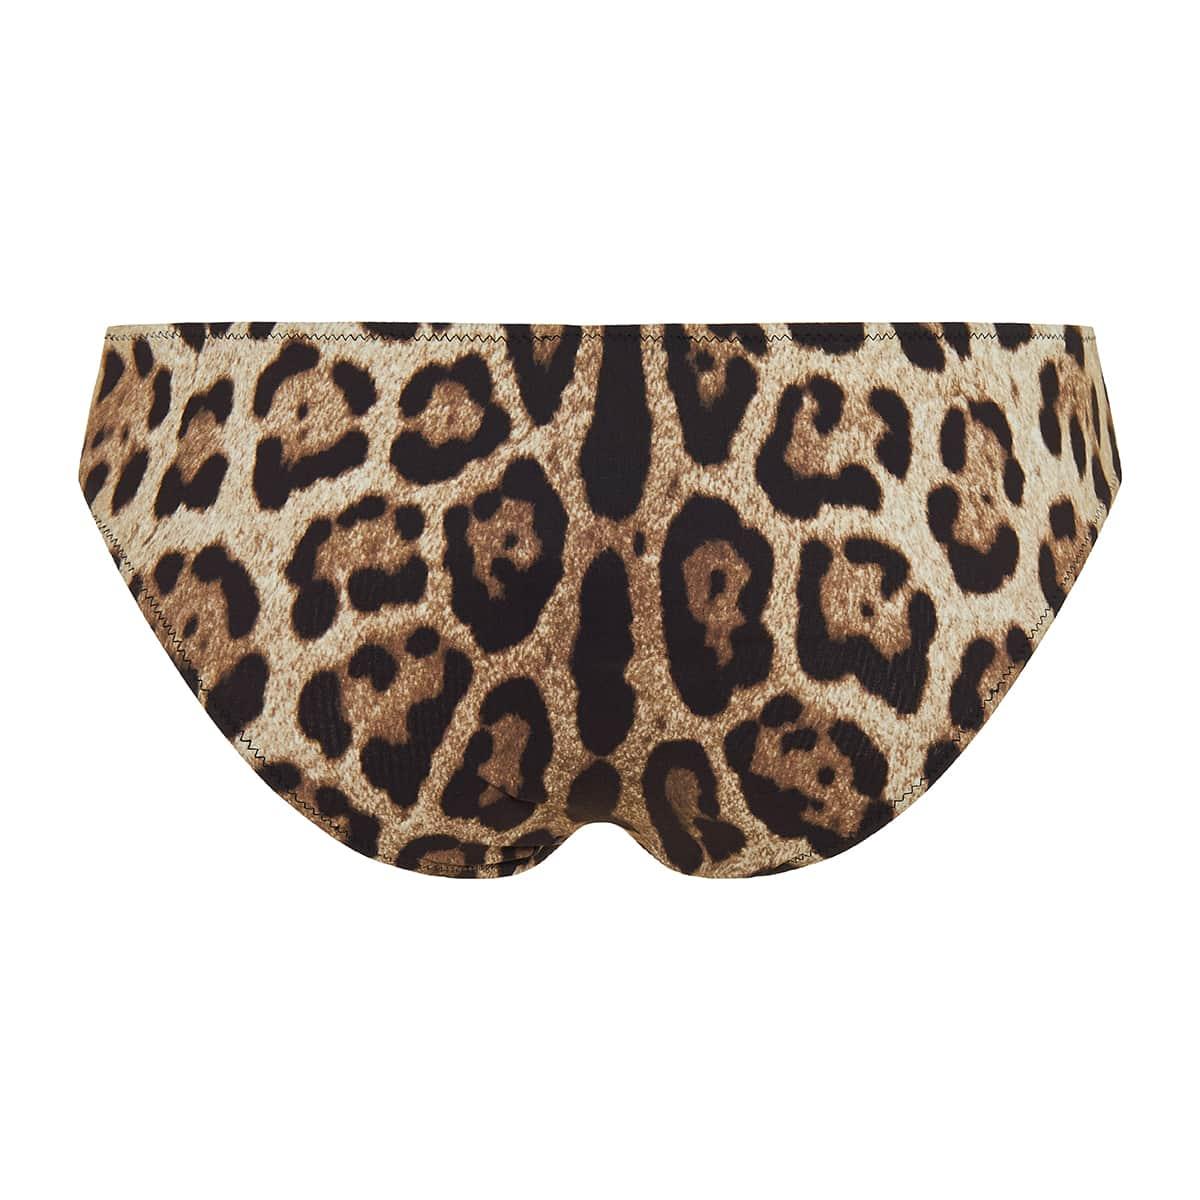 Leopard bikini bottoms